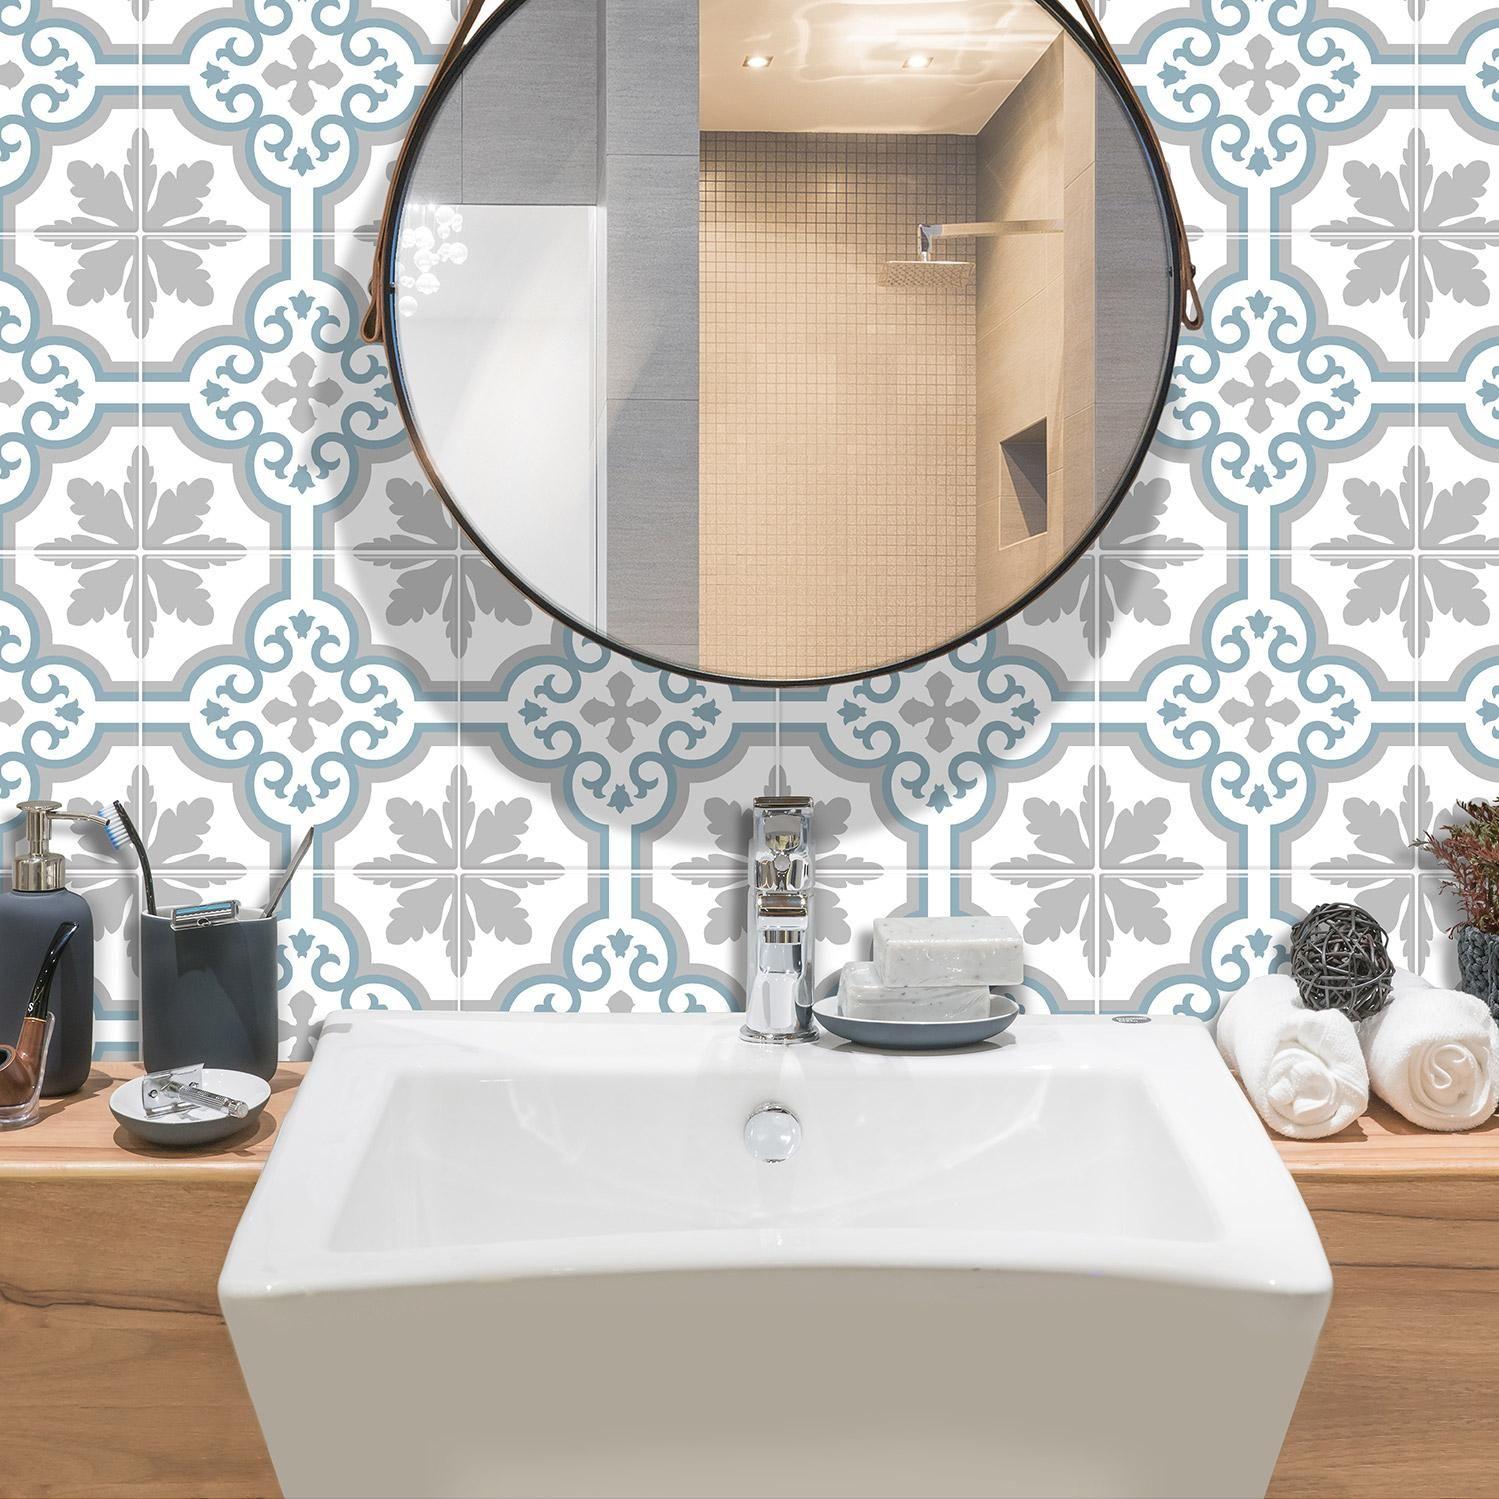 Credence Adhesive Imitant Carrelage Girona Bleu L 19 68 X L 19 68 Cm Smart Til Smart Tiles Credence Adhesive Parement Mural Et Deco Toilettes